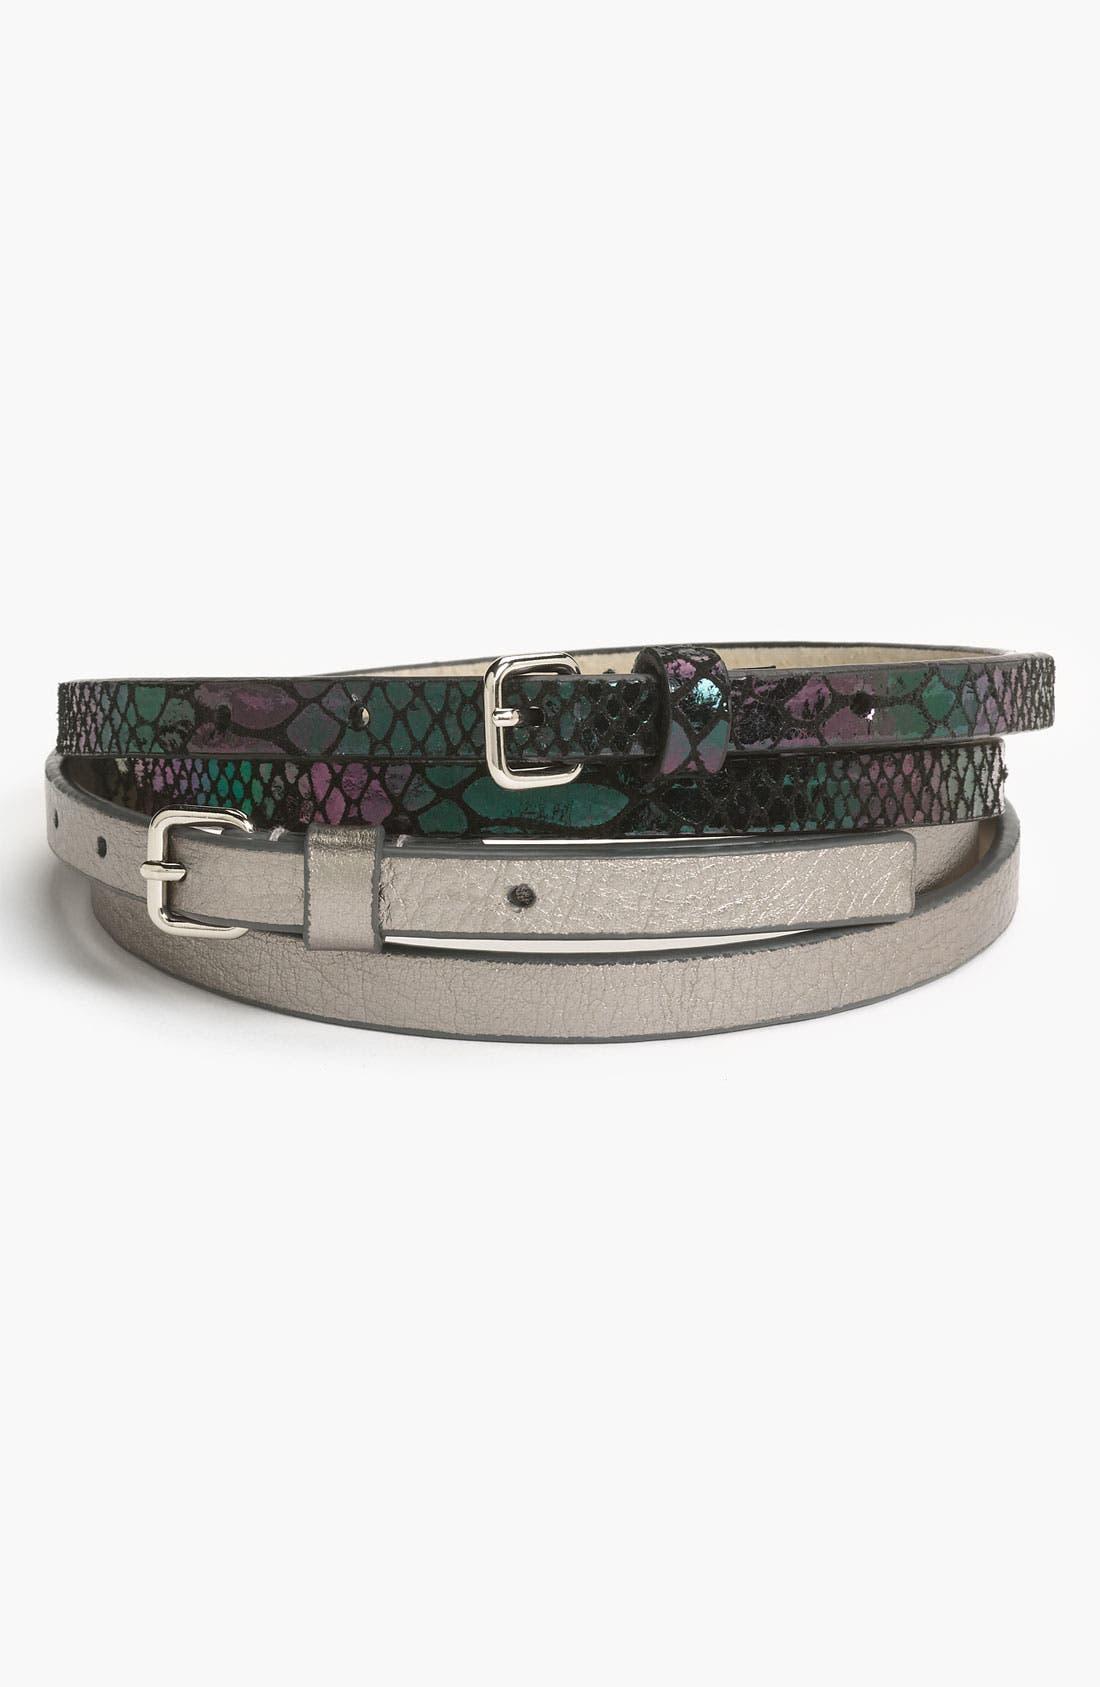 Main Image - Lodis '2-Fer' Leather Belts